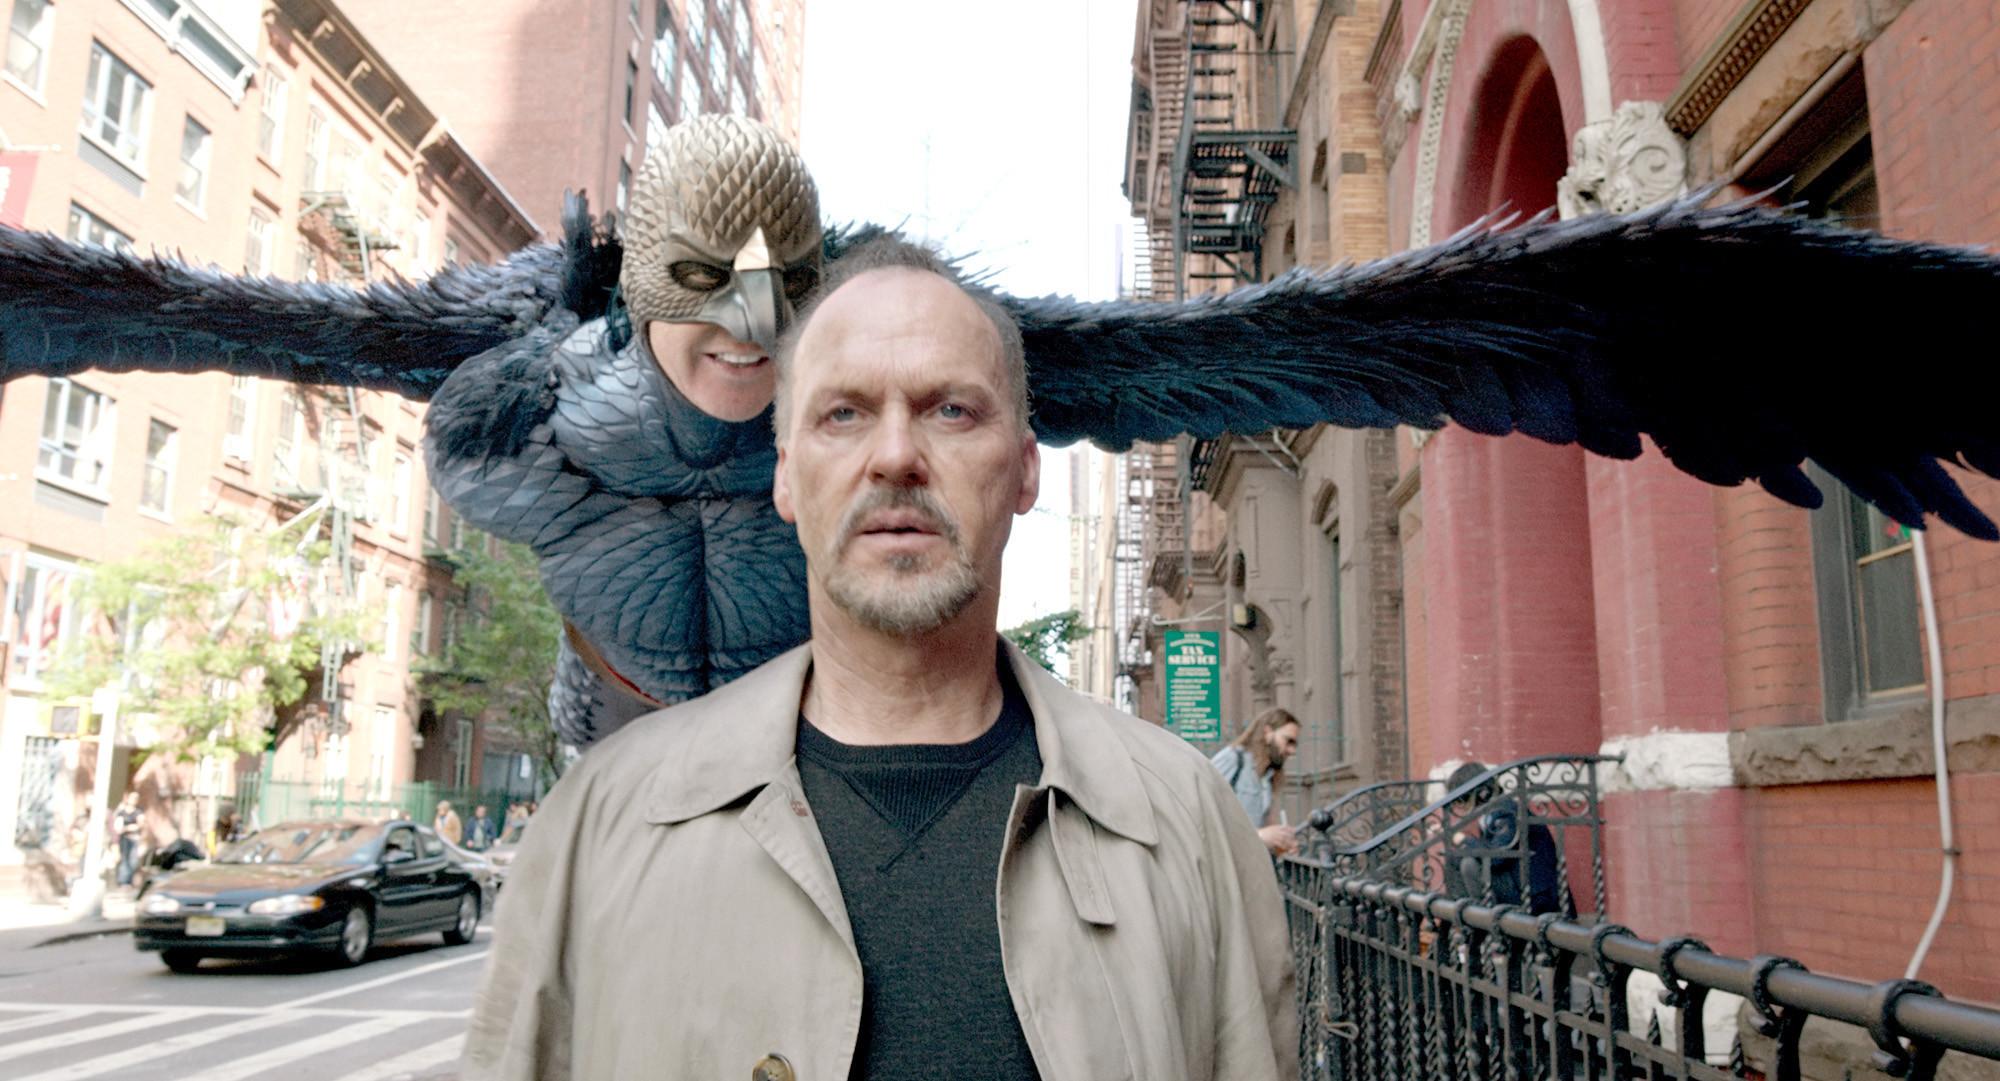 Michael Keaton stars as Riggan Thomson and Birdmanin  Birdman or (The Unexpected Virtue of Ignorance)  (2014). Image propertyof Fox Searchlight.